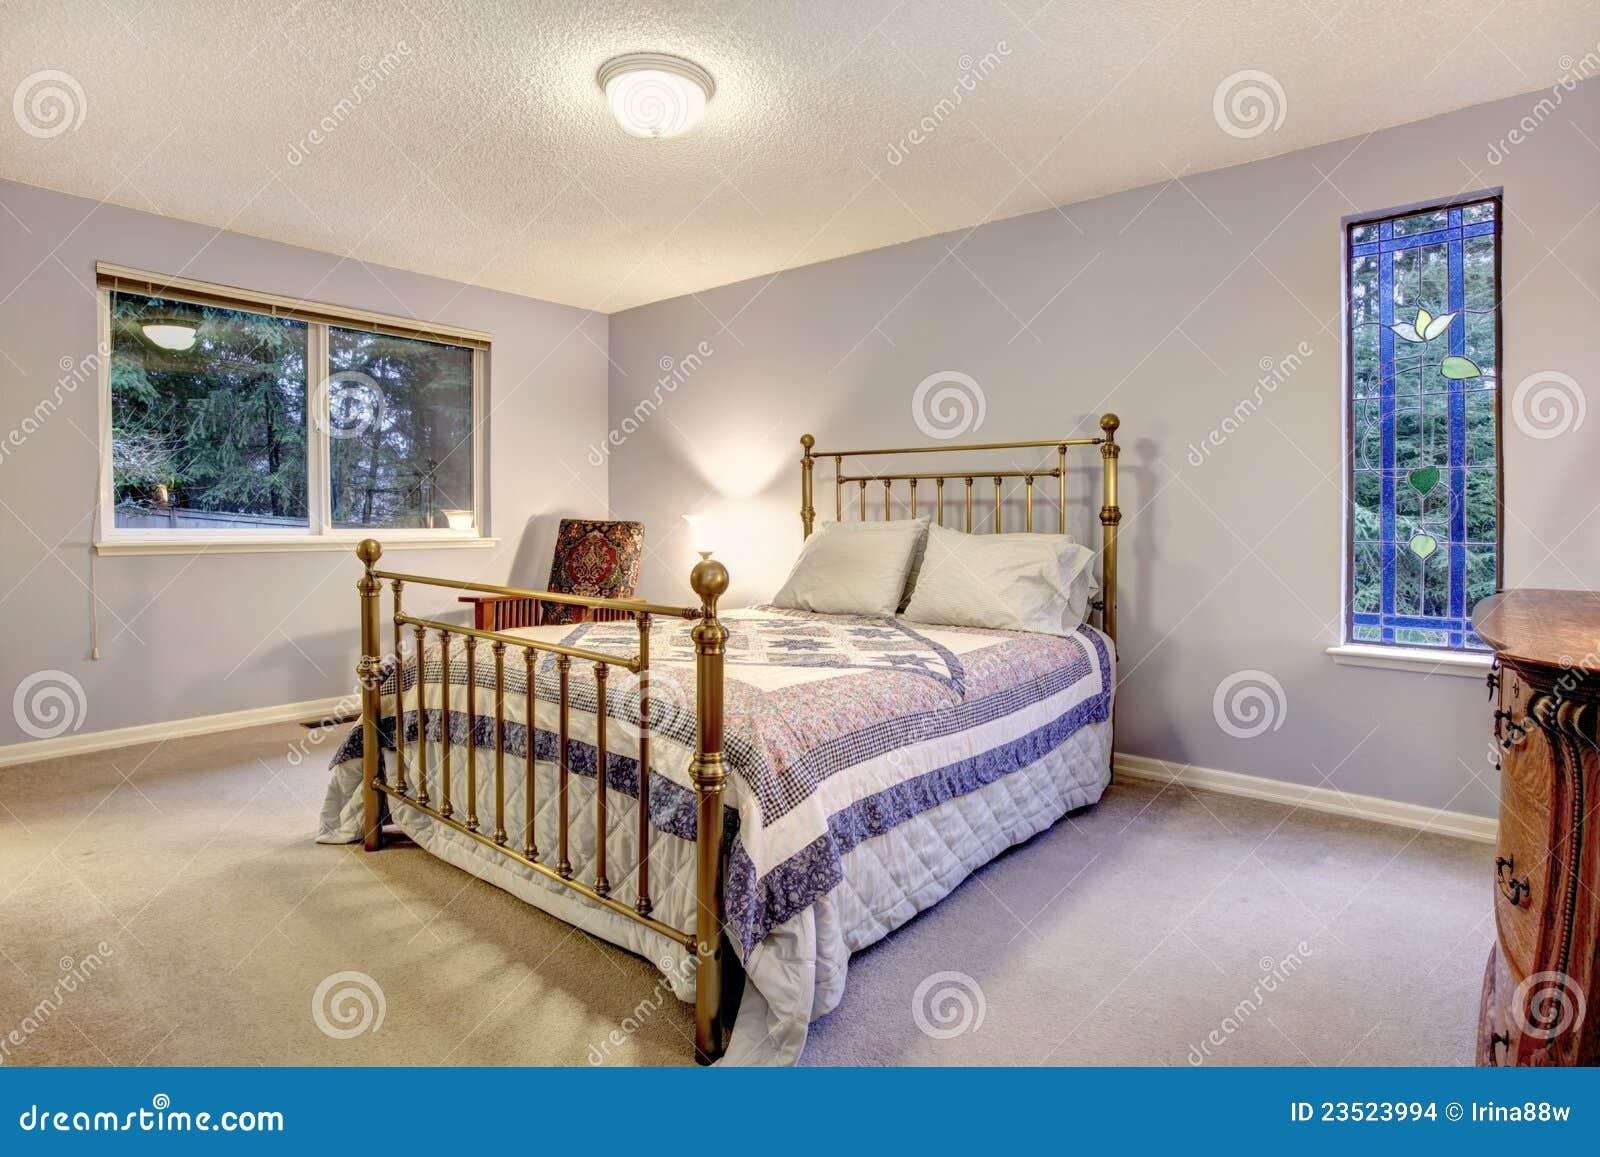 Simple blue bedroom with metal bed